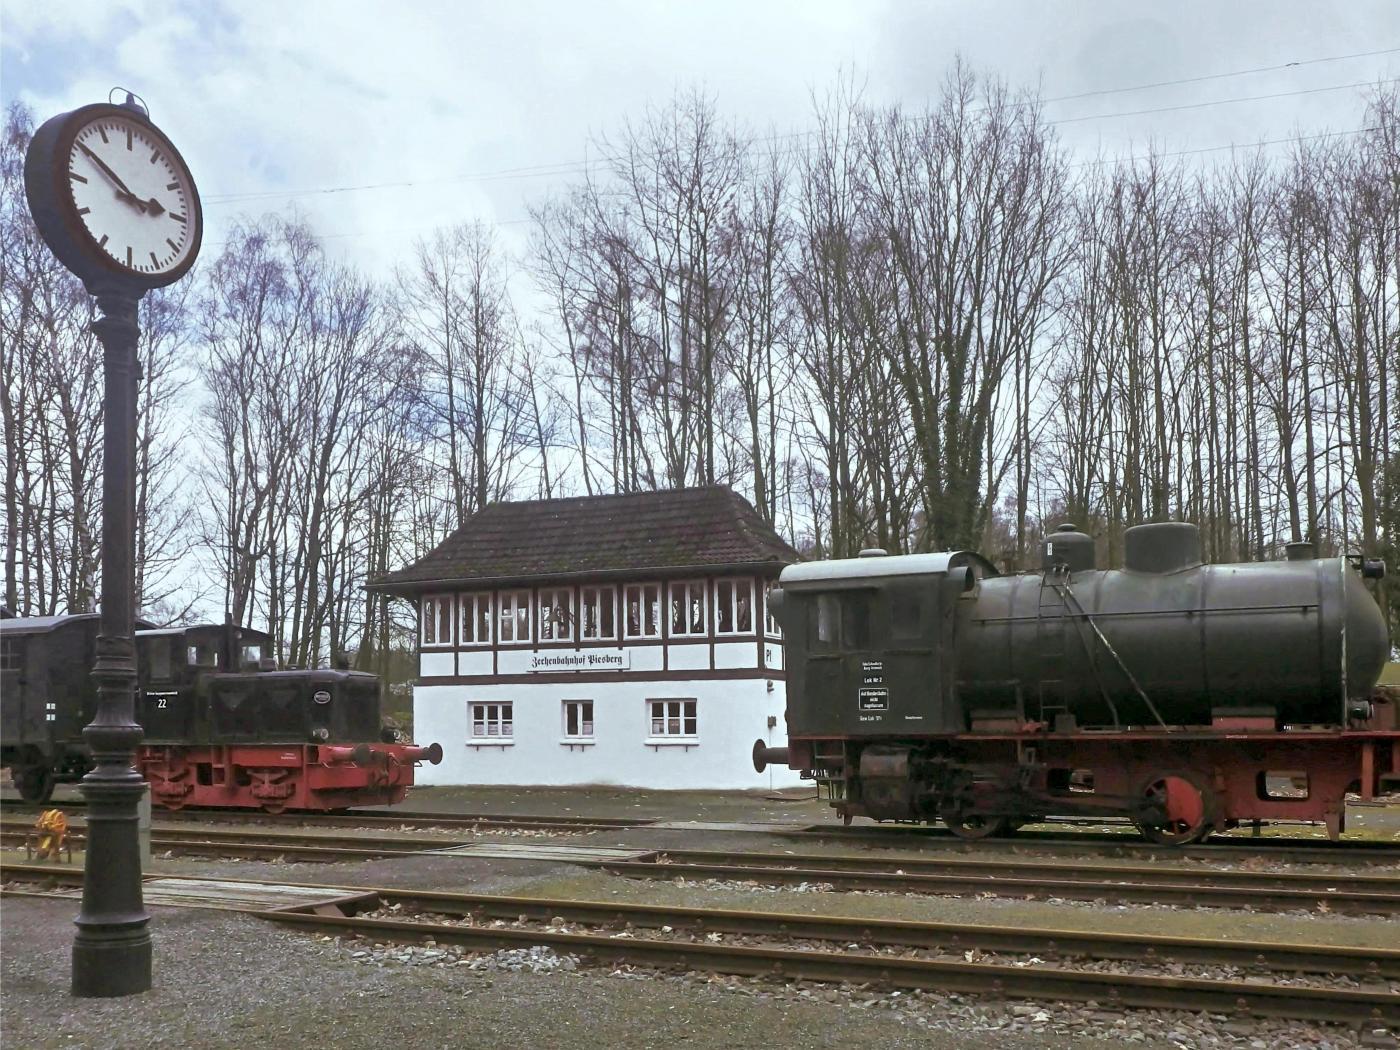 Alter Zechenbahnhof Piesberg